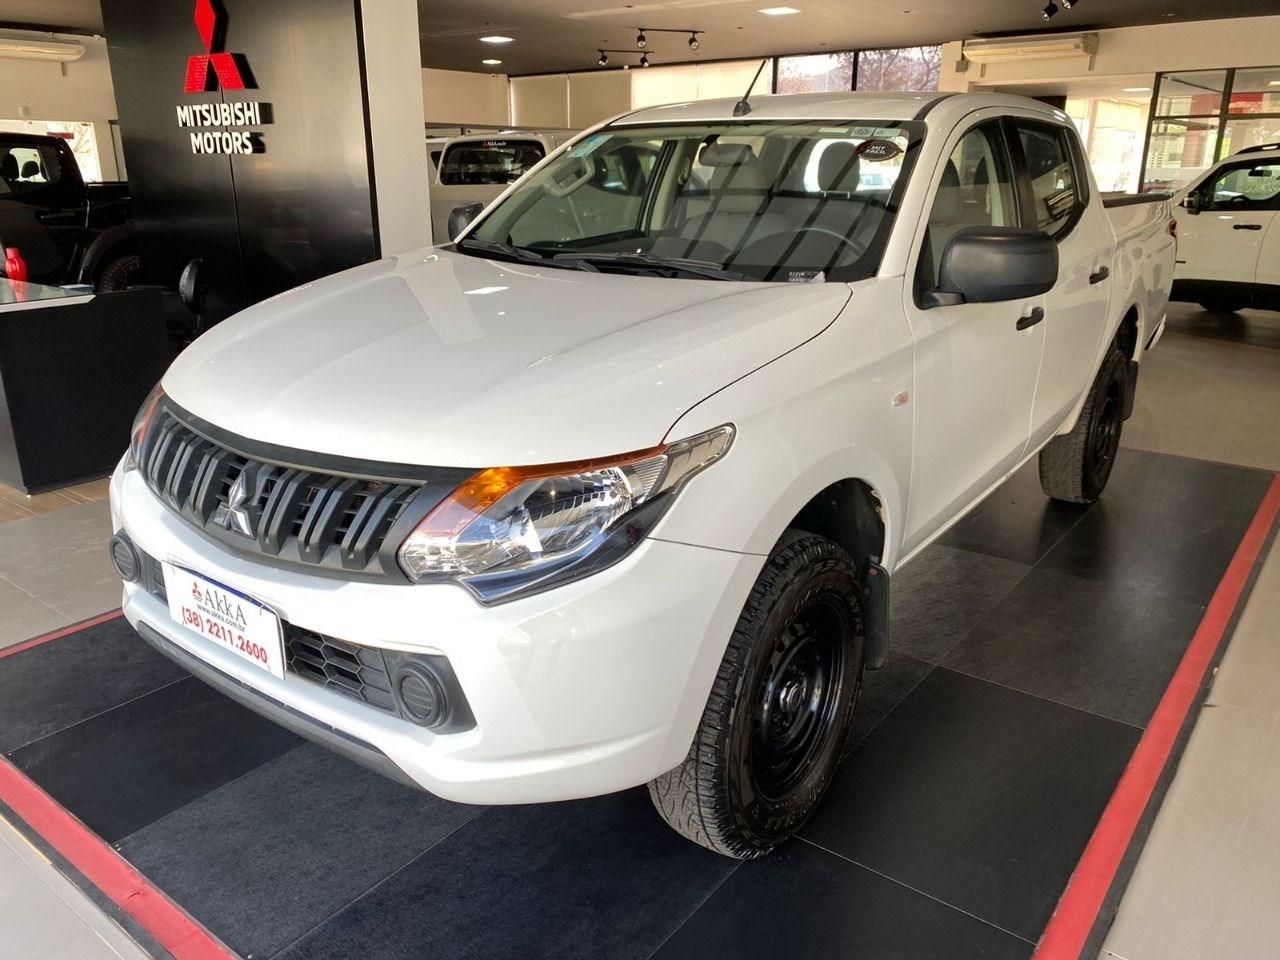 //www.autoline.com.br/carro/mitsubishi/l200-triton-sport-24-gl-16v-diesel-4p-4x4-turbo-manual/2020/divinopolis-mg/15721729